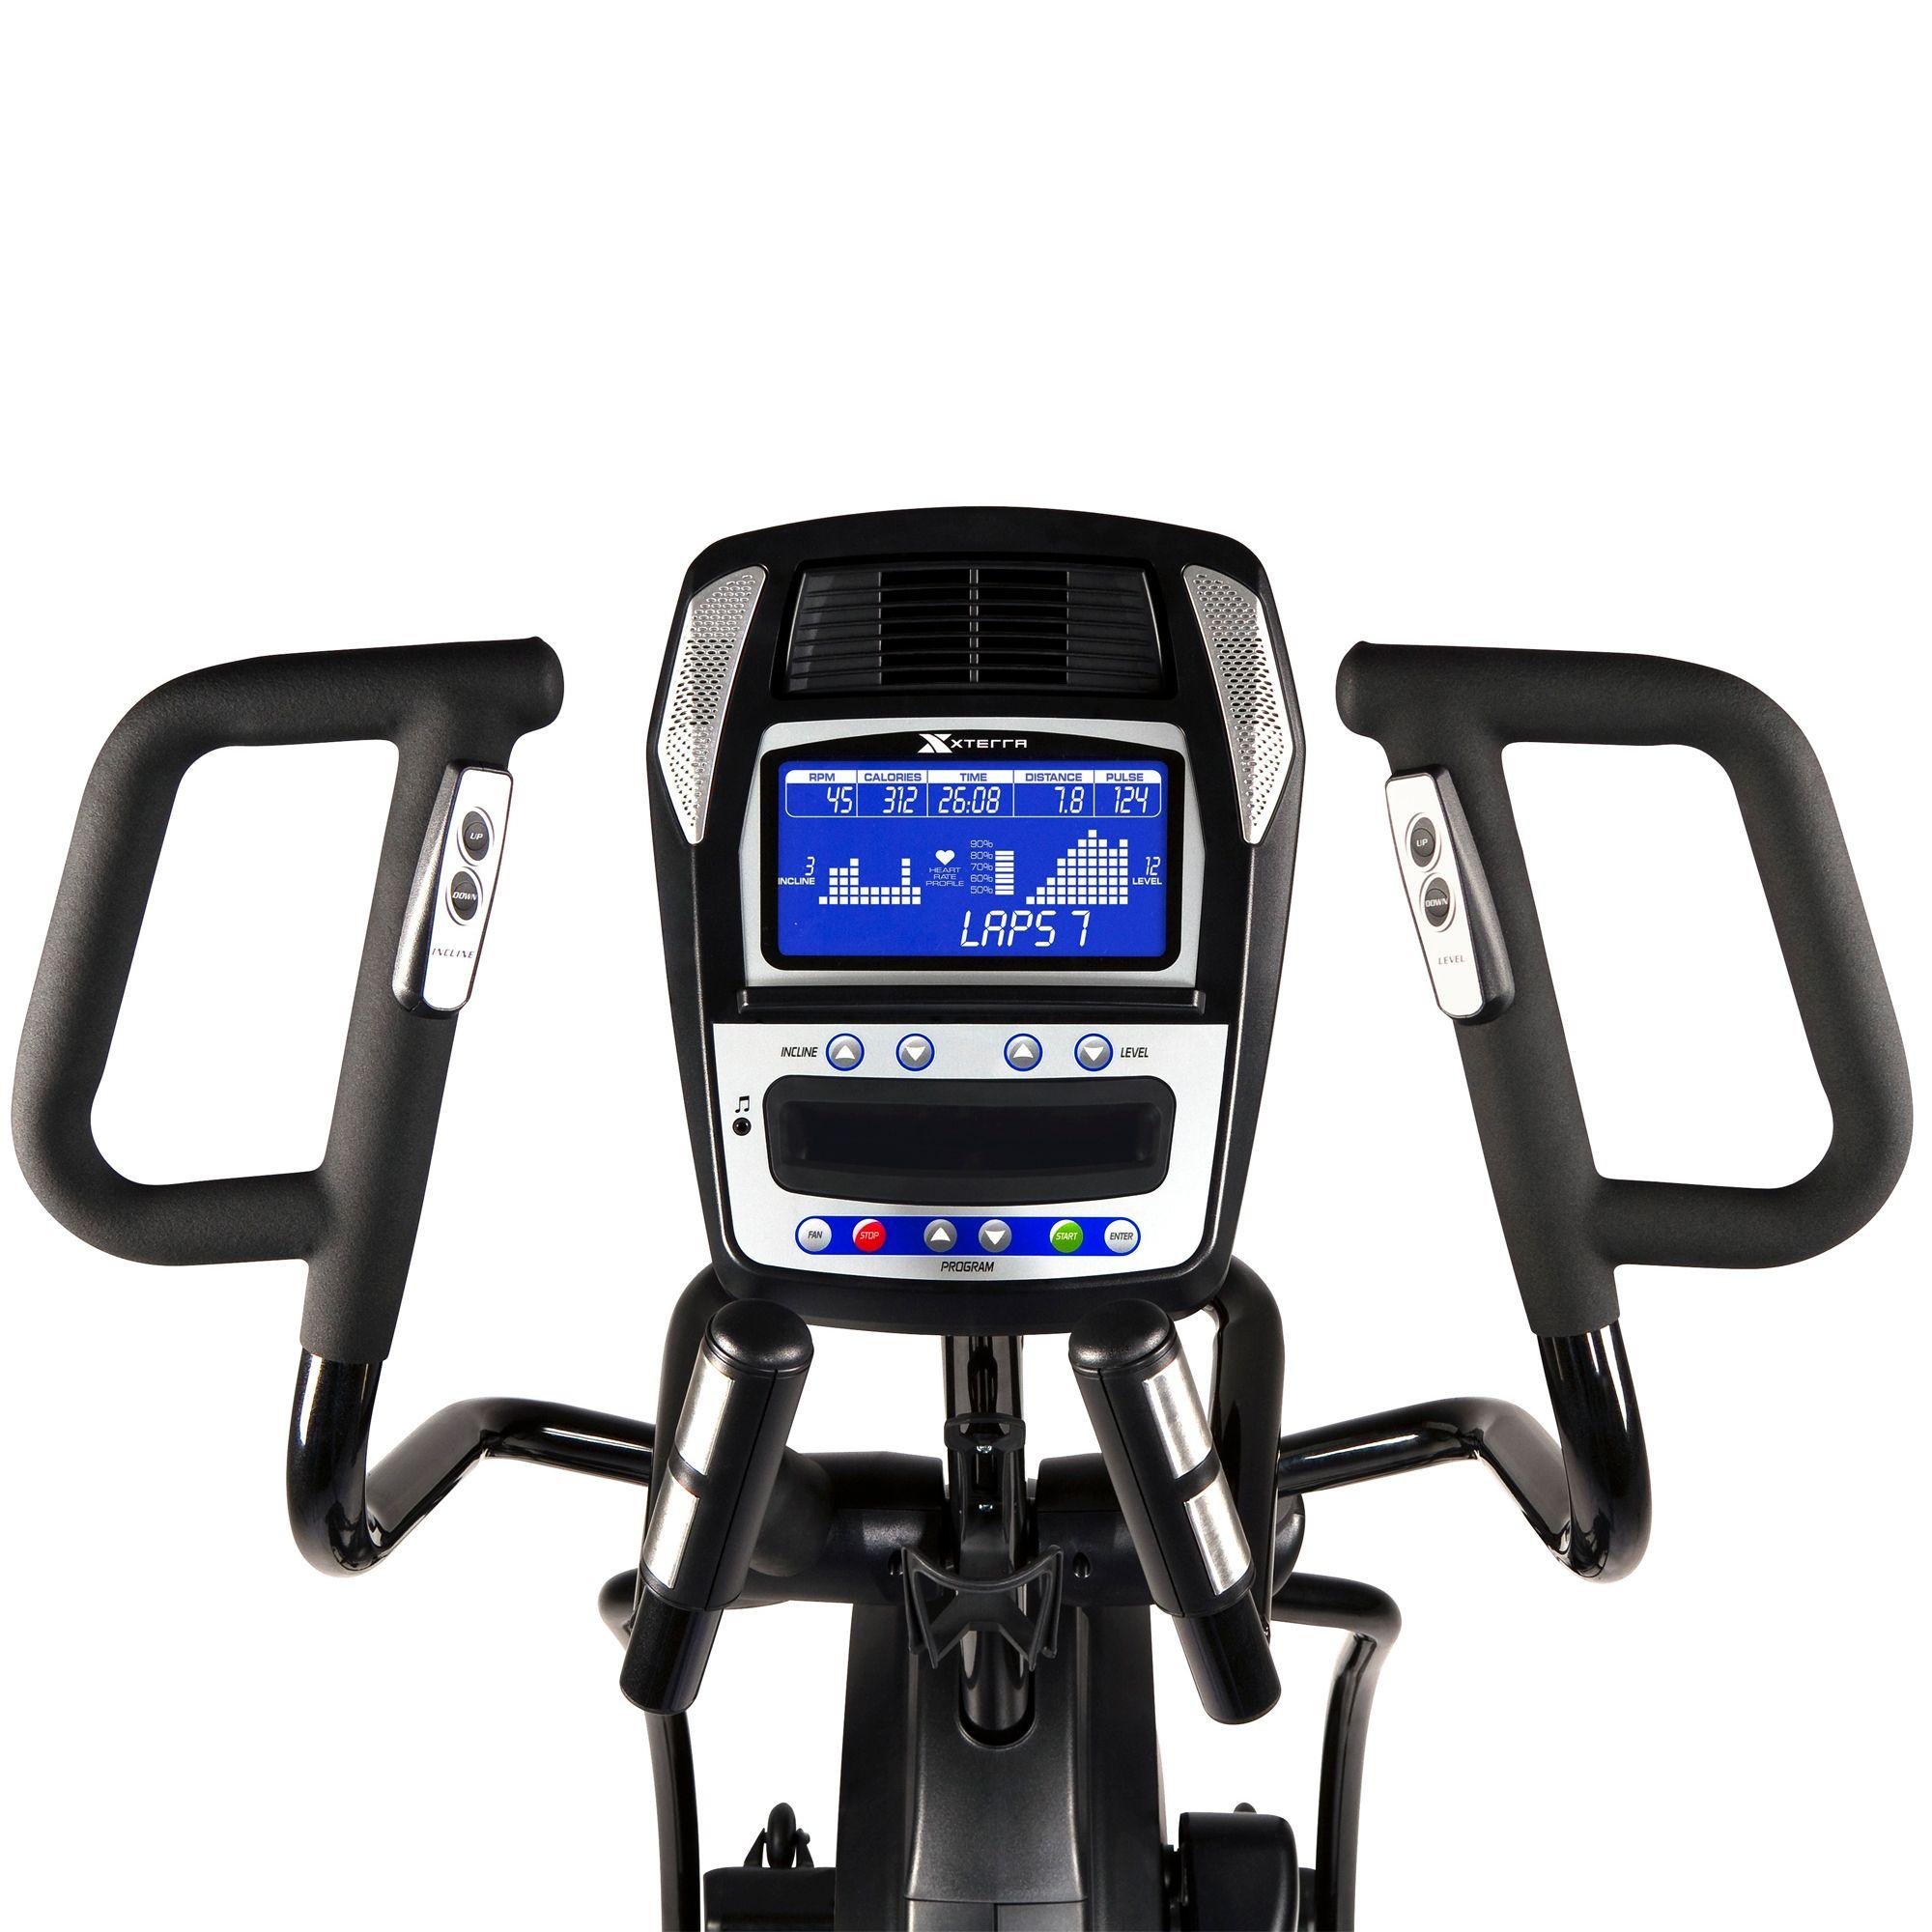 Xterra Free Style 5.8e Elliptical Cross Trainer 2015